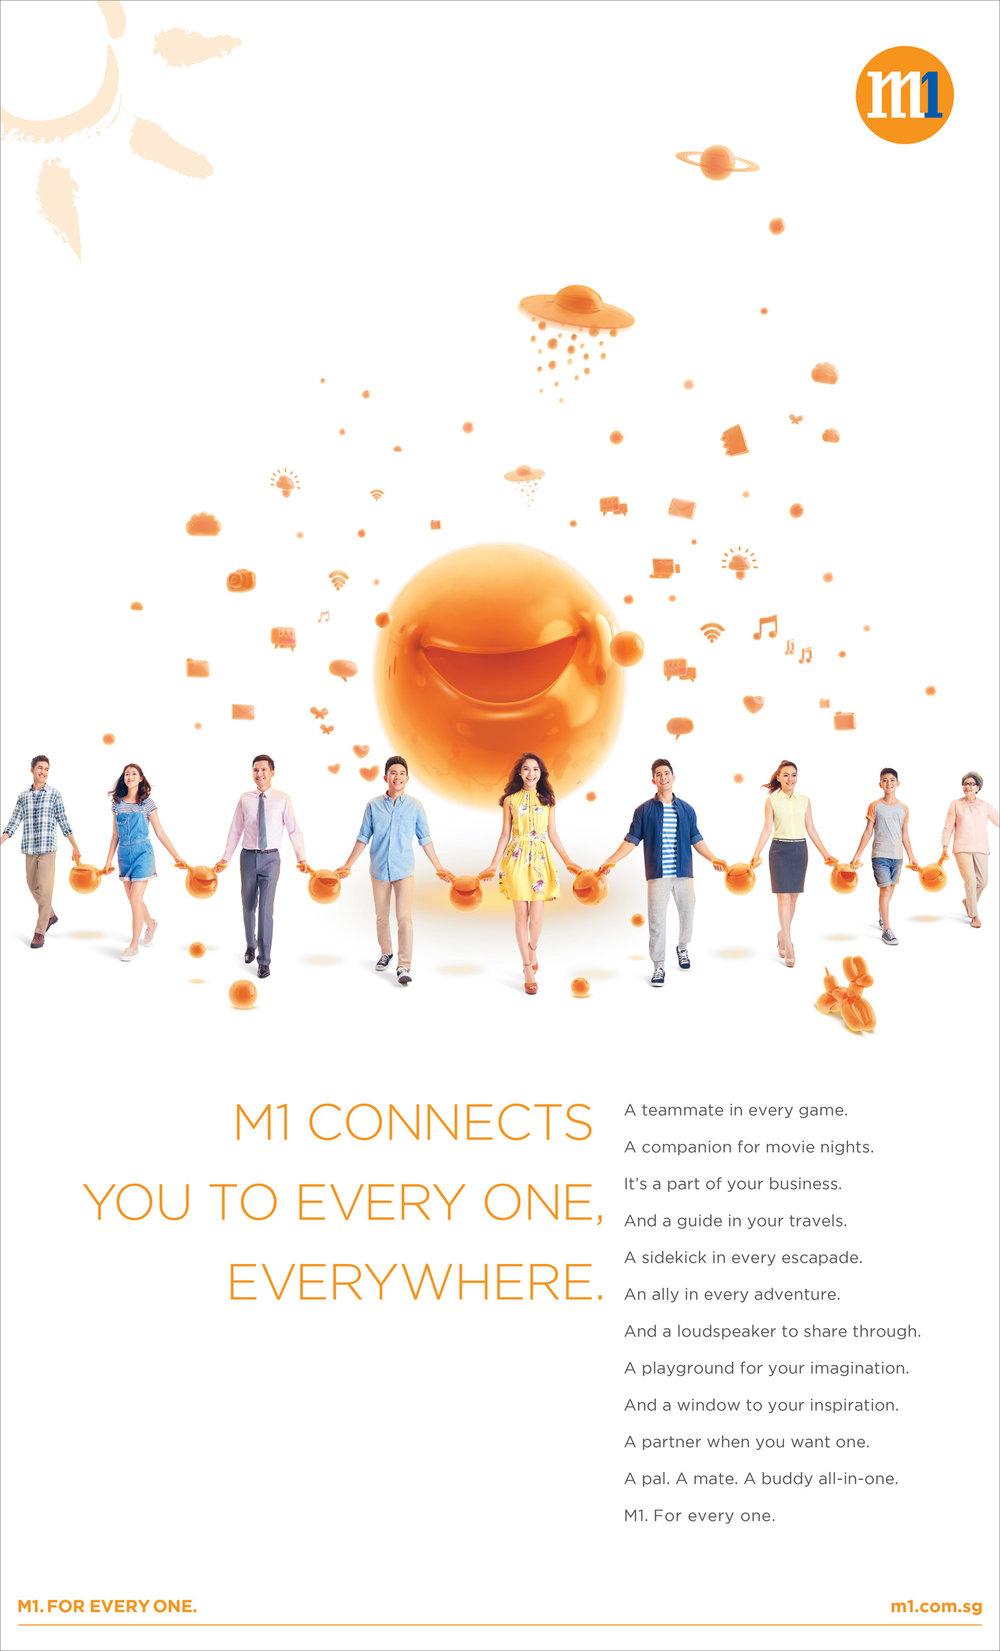 DMOBA1110625 M1 Brand 2016 Launch Ad ST FPFC 540mmH x 327mmW R2.jpg